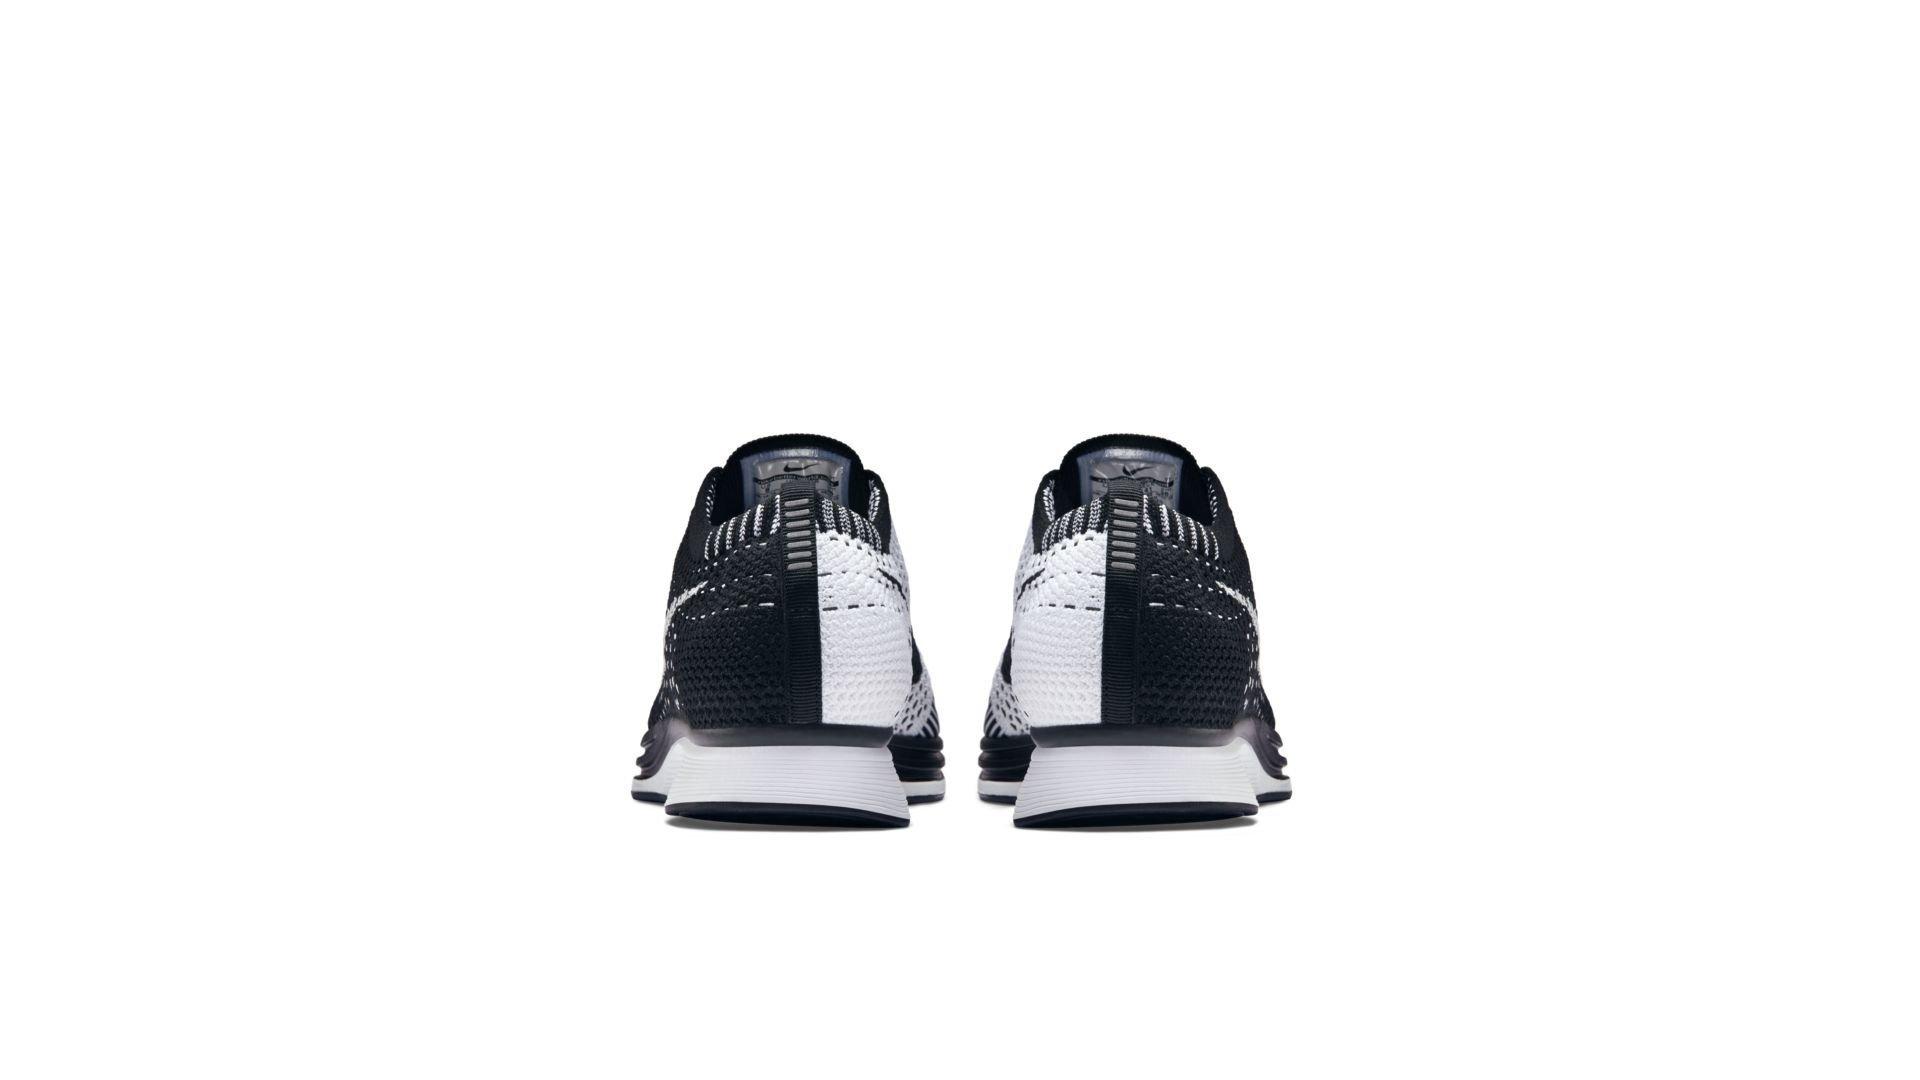 Nike Flyknit Racer Black Tongue (526628-002)